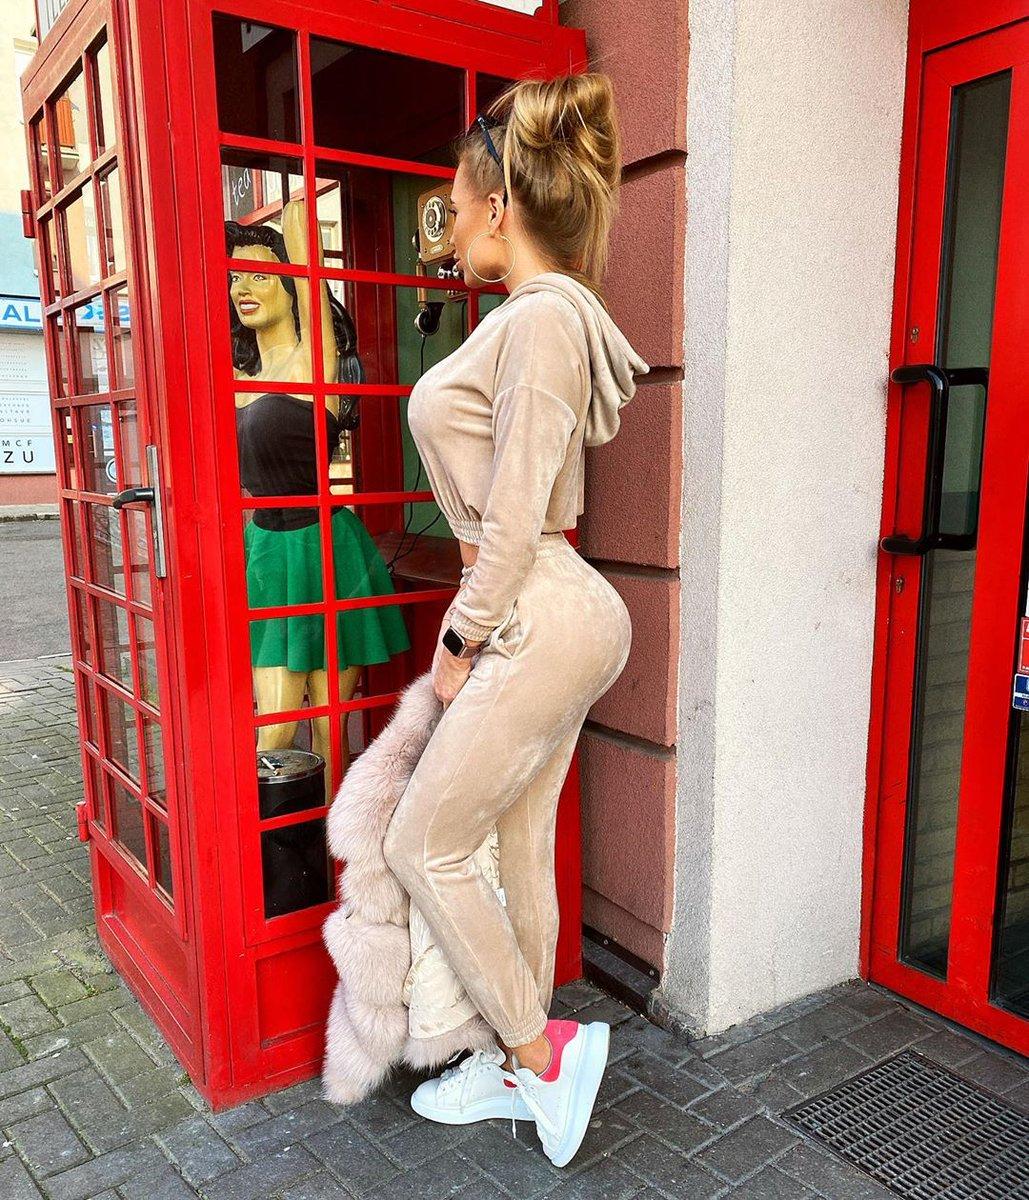 Hey girl  what are you doing there?  track suit #boholife_boholife  #welurowelove#dres#dreszweluru#beige#lookoftheday#stylizacja#fashionblogger#fashionlover#sweetoutfit pic.twitter.com/HUQDqQ7oVK